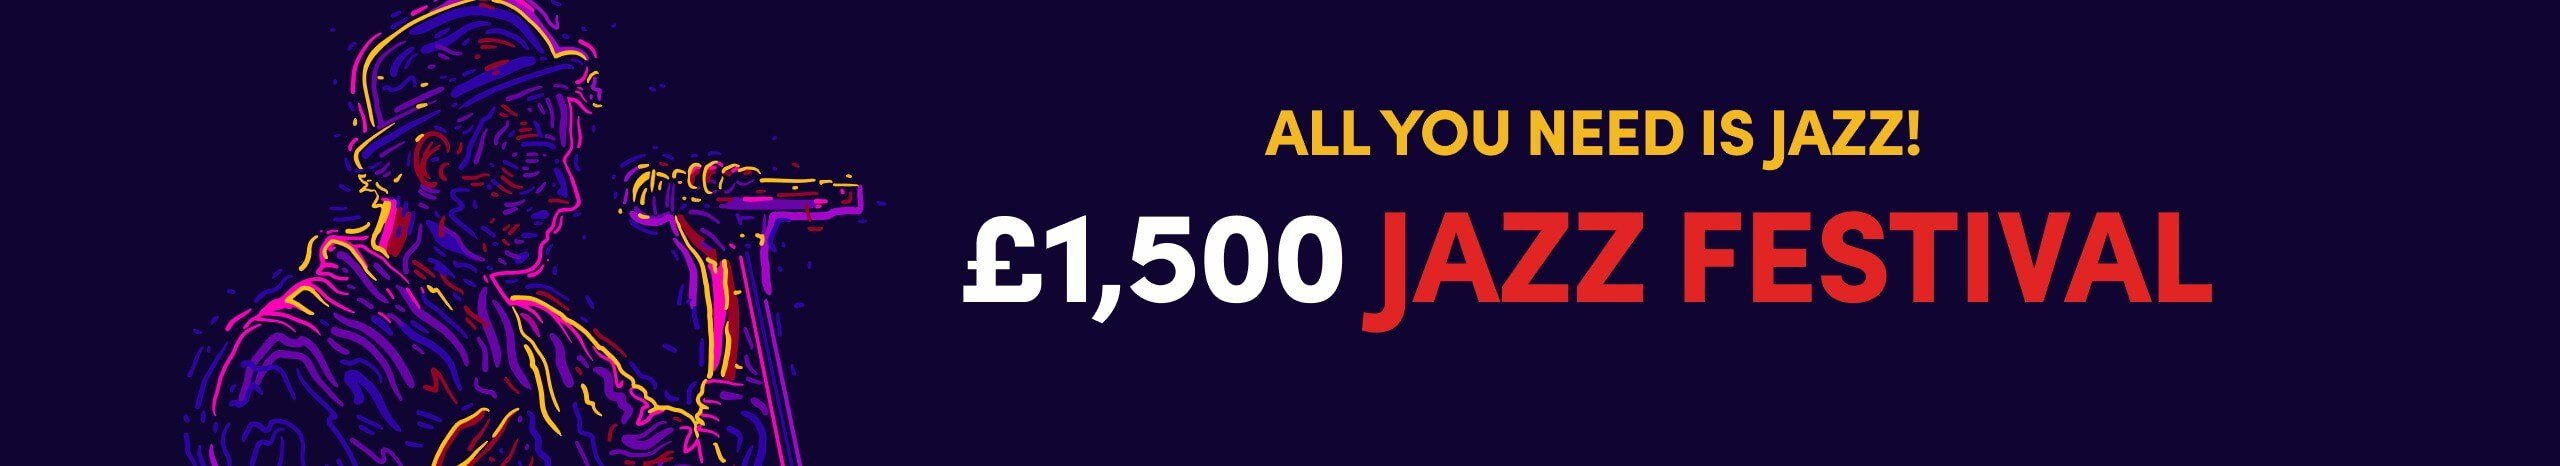 £1,500 Jazz Festival